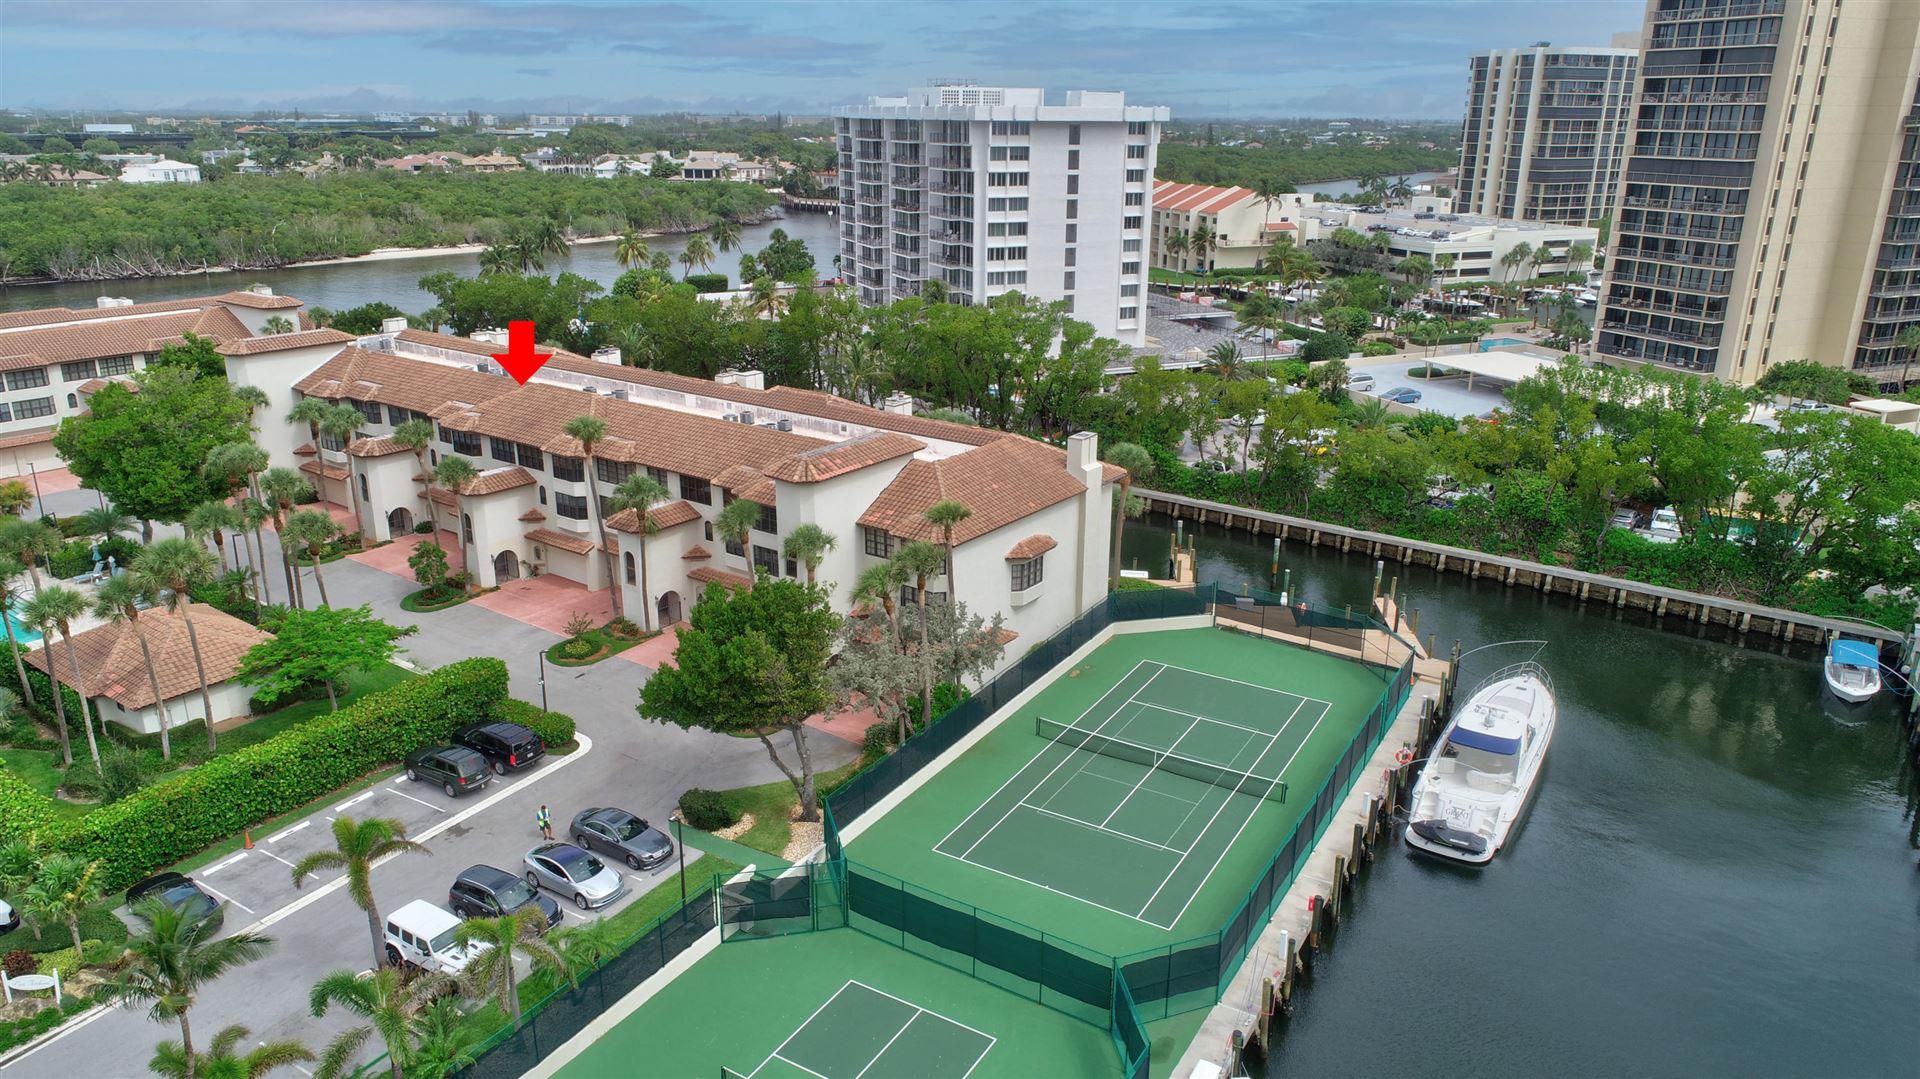 Photo of 4401 N Ocean Blvd #12, Boca Raton, FL 33431 (MLS # RX-10725233)